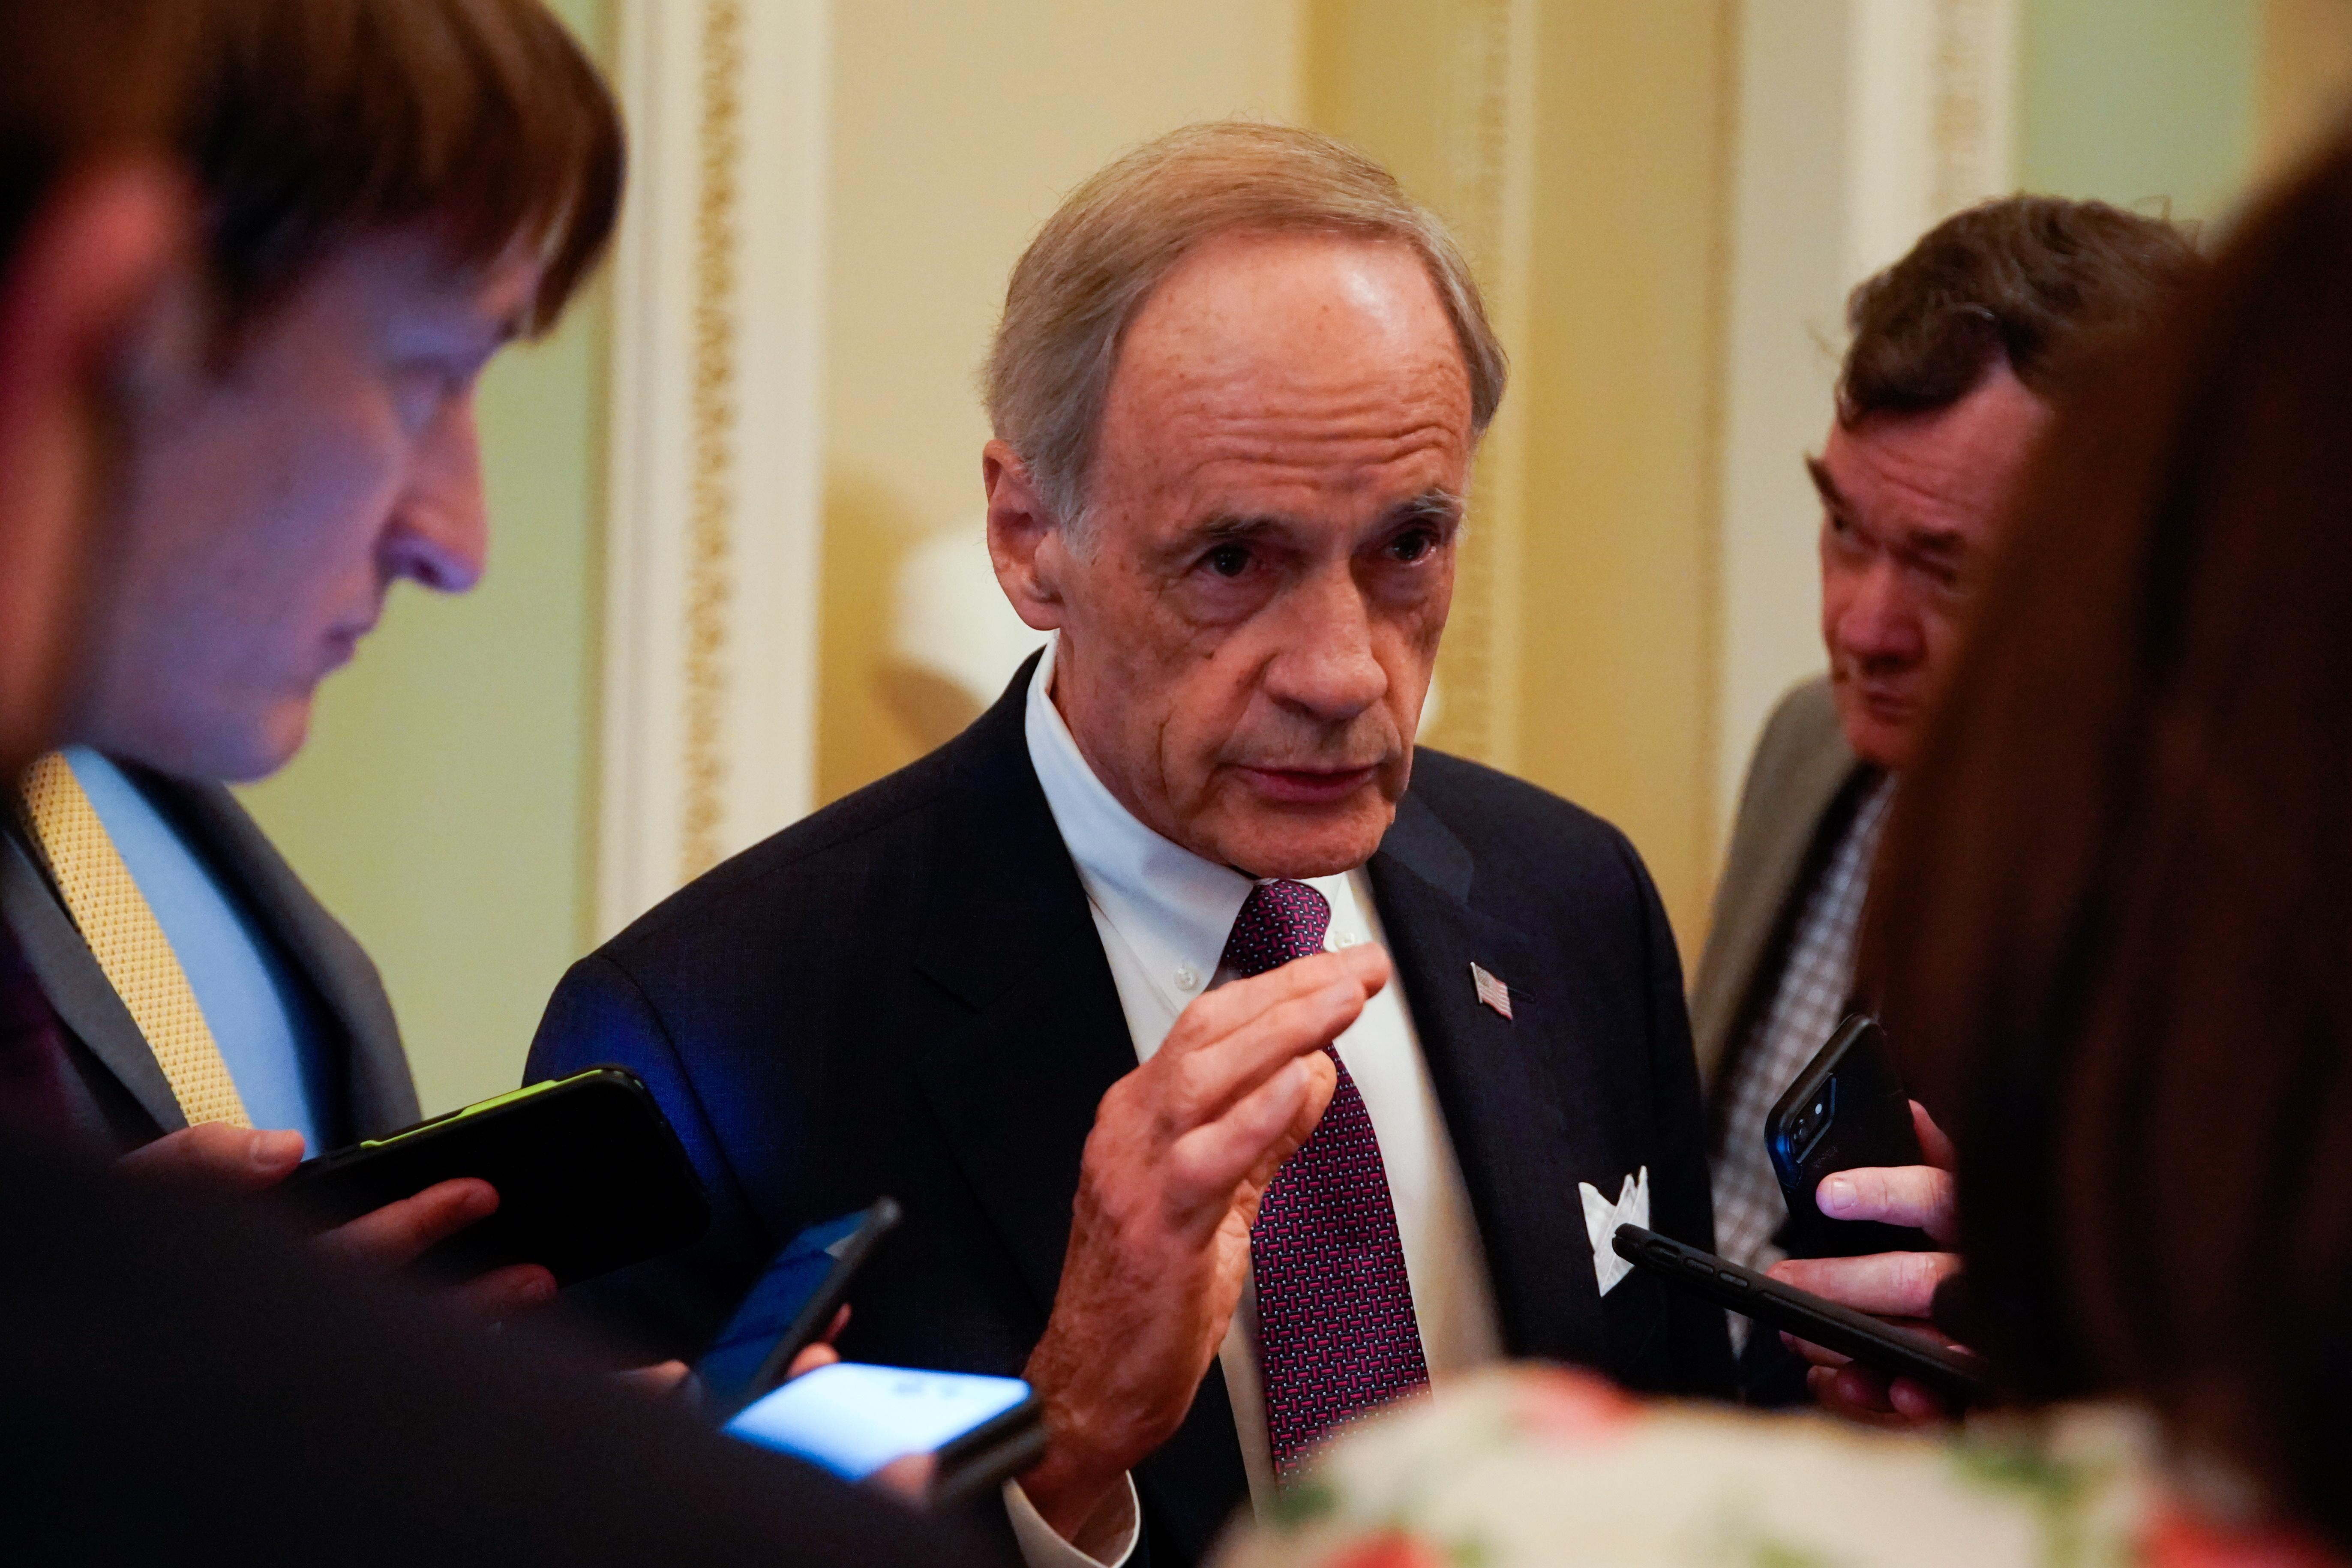 U.S. Senator Tom Carper (D-DE) speaks with reporters at the U.S. Capitol in Washington, U.S., July 22, 2021. REUTERS/Elizabeth Frantz